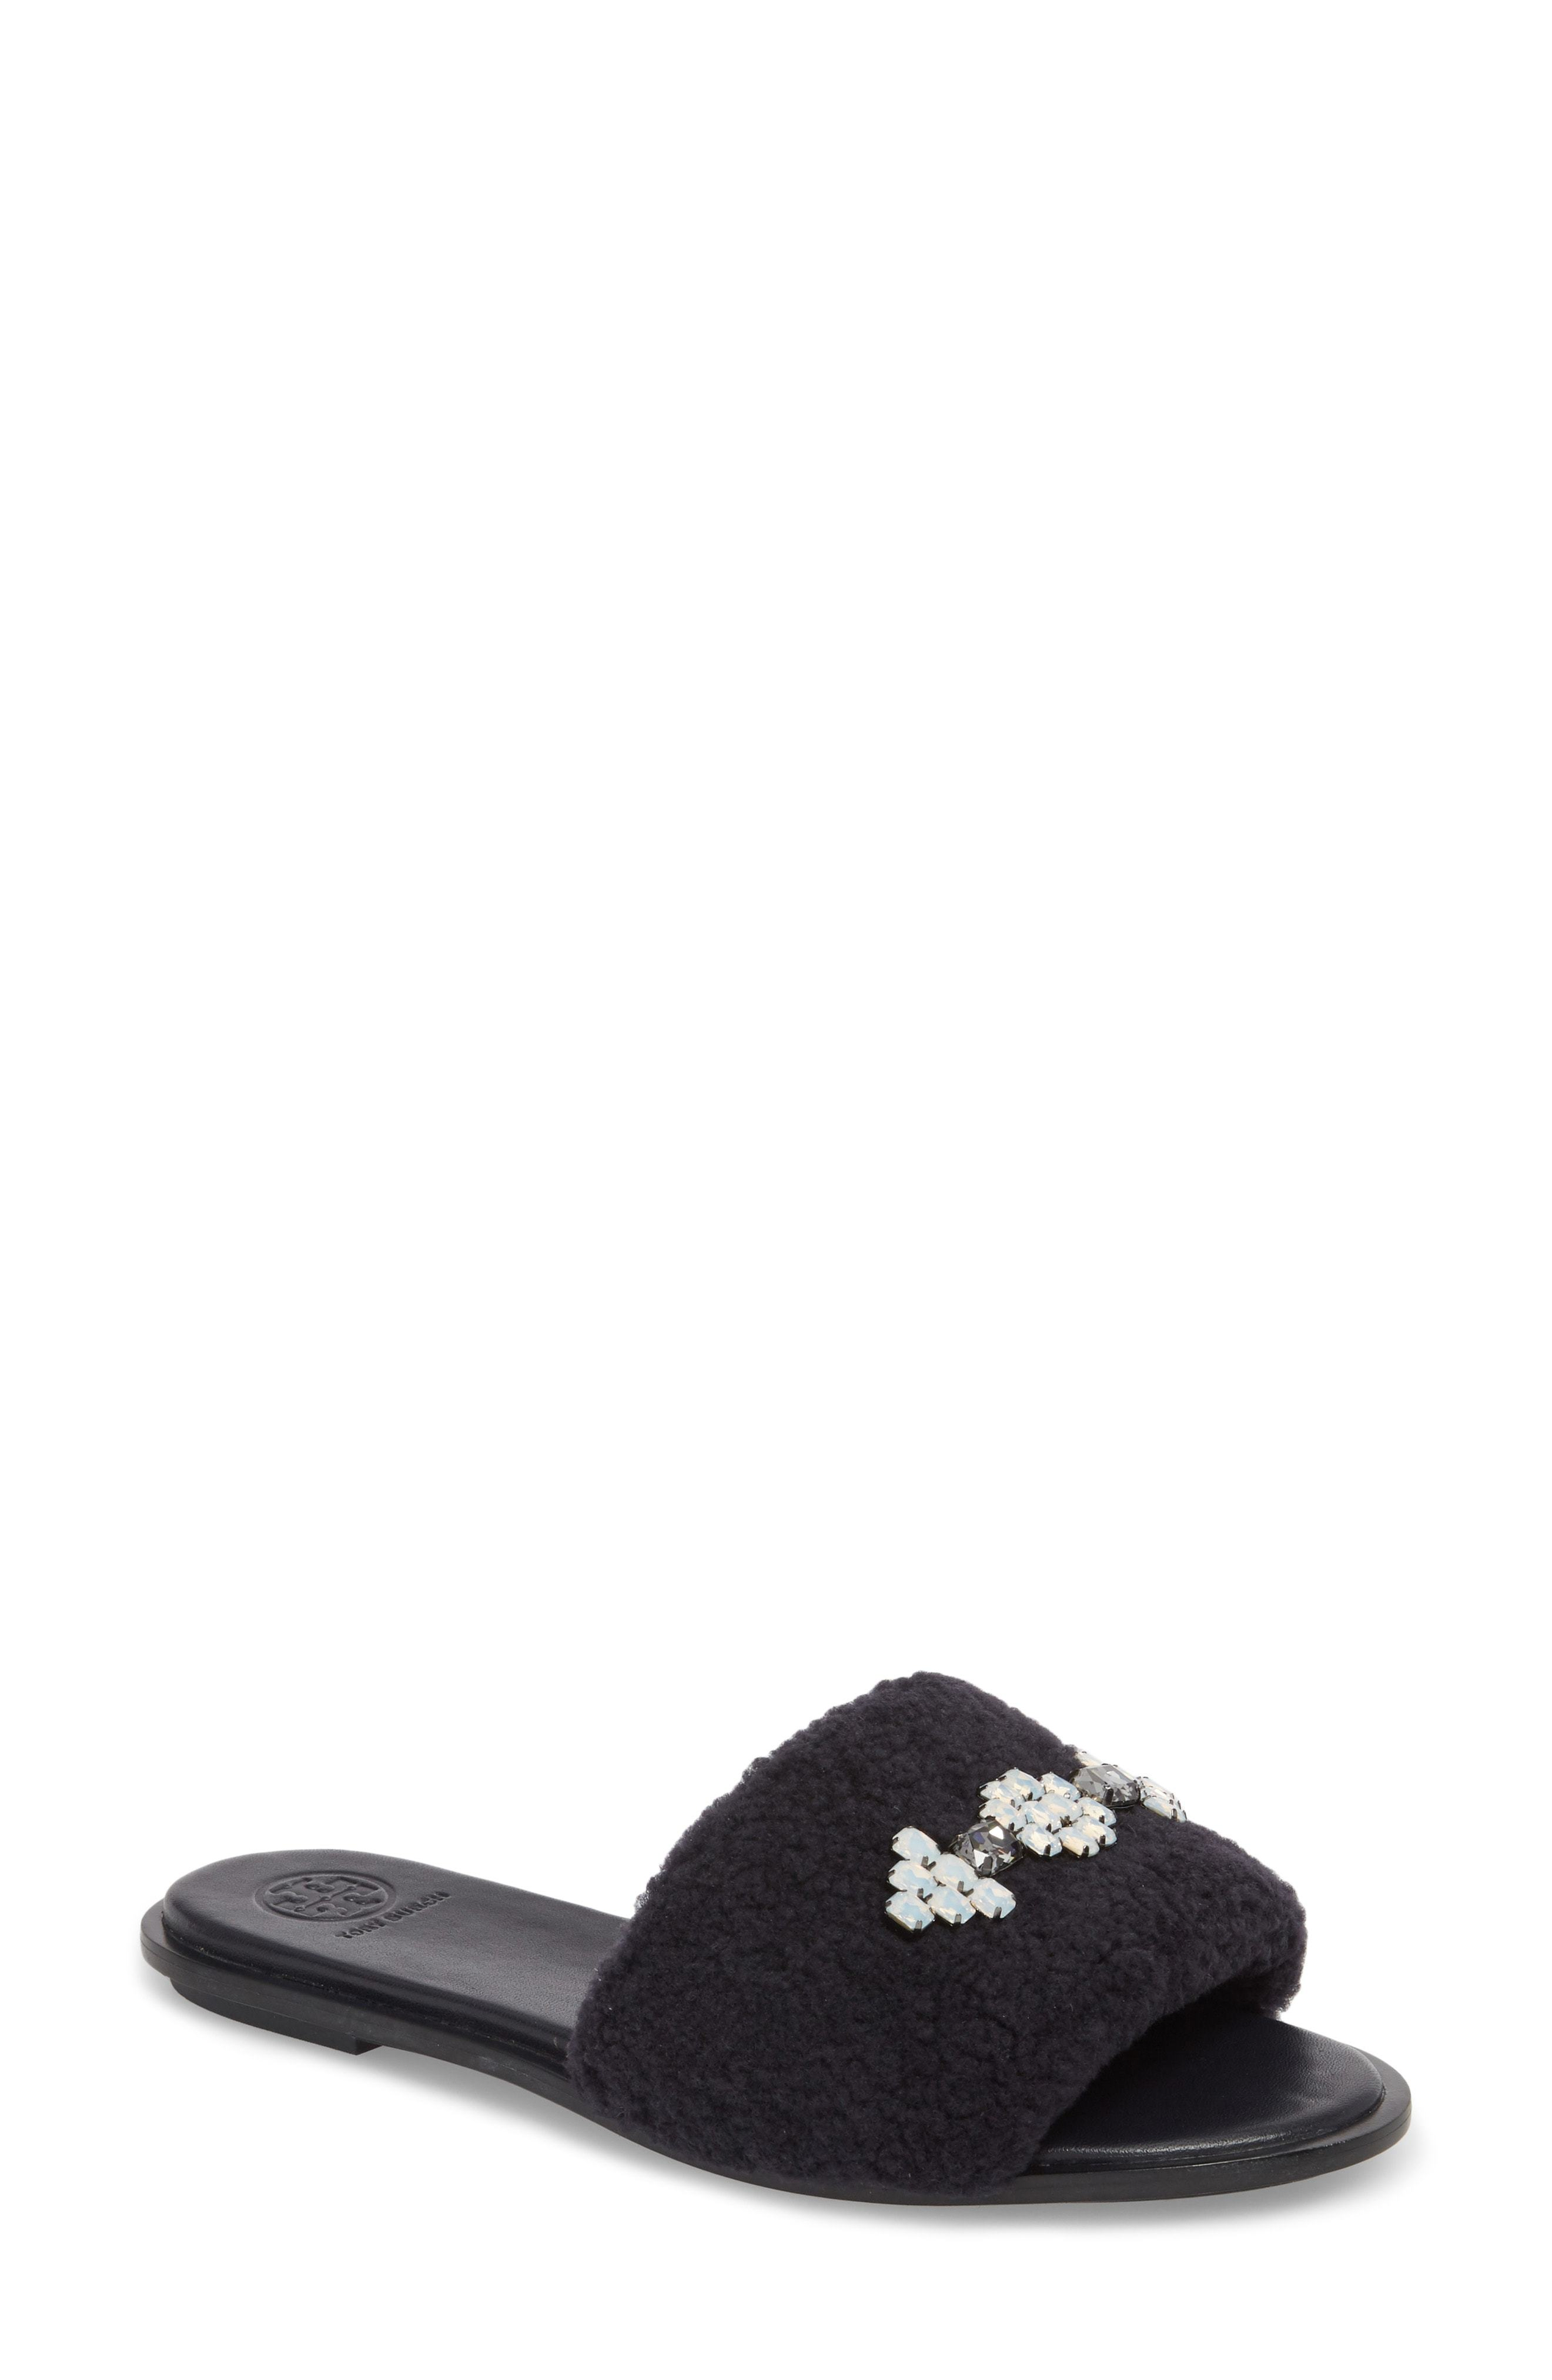 ee1a11b936b ... Sandals Tory Burch Embellished Genuine Shearling Slide Sandal